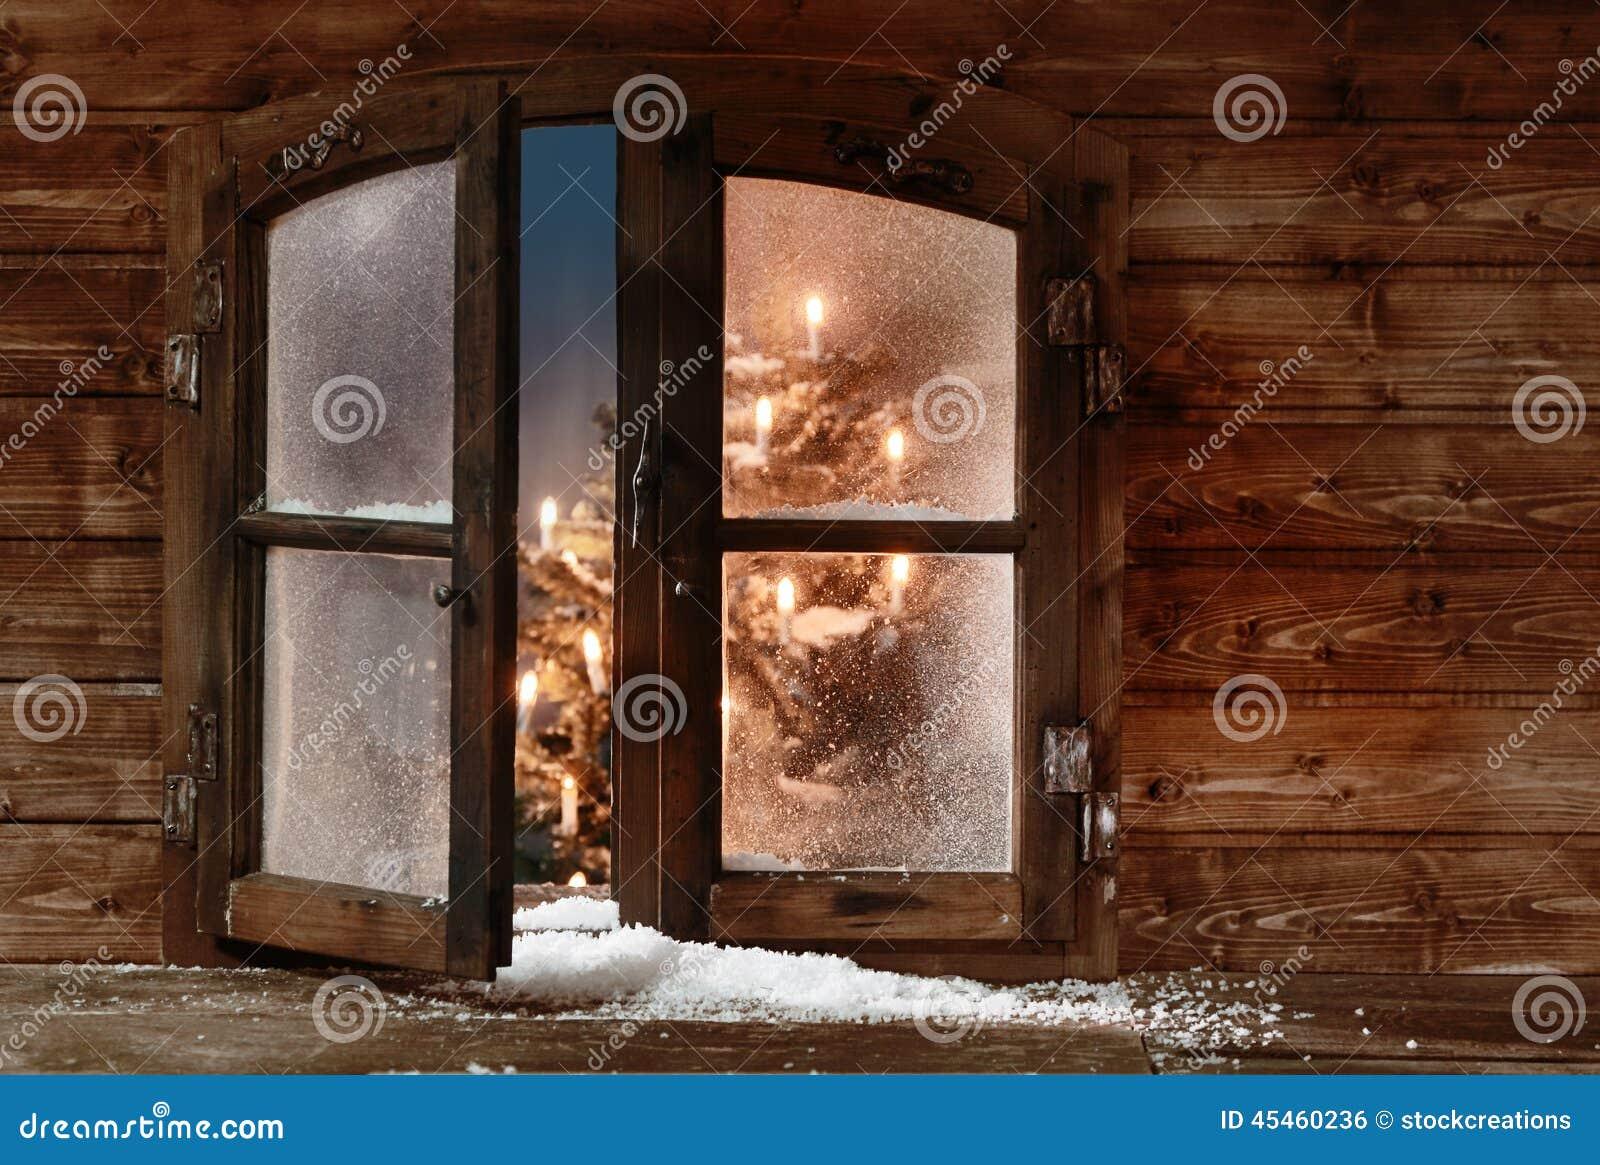 Snow At Open Wooden Christmas Window Pane Stock Photo